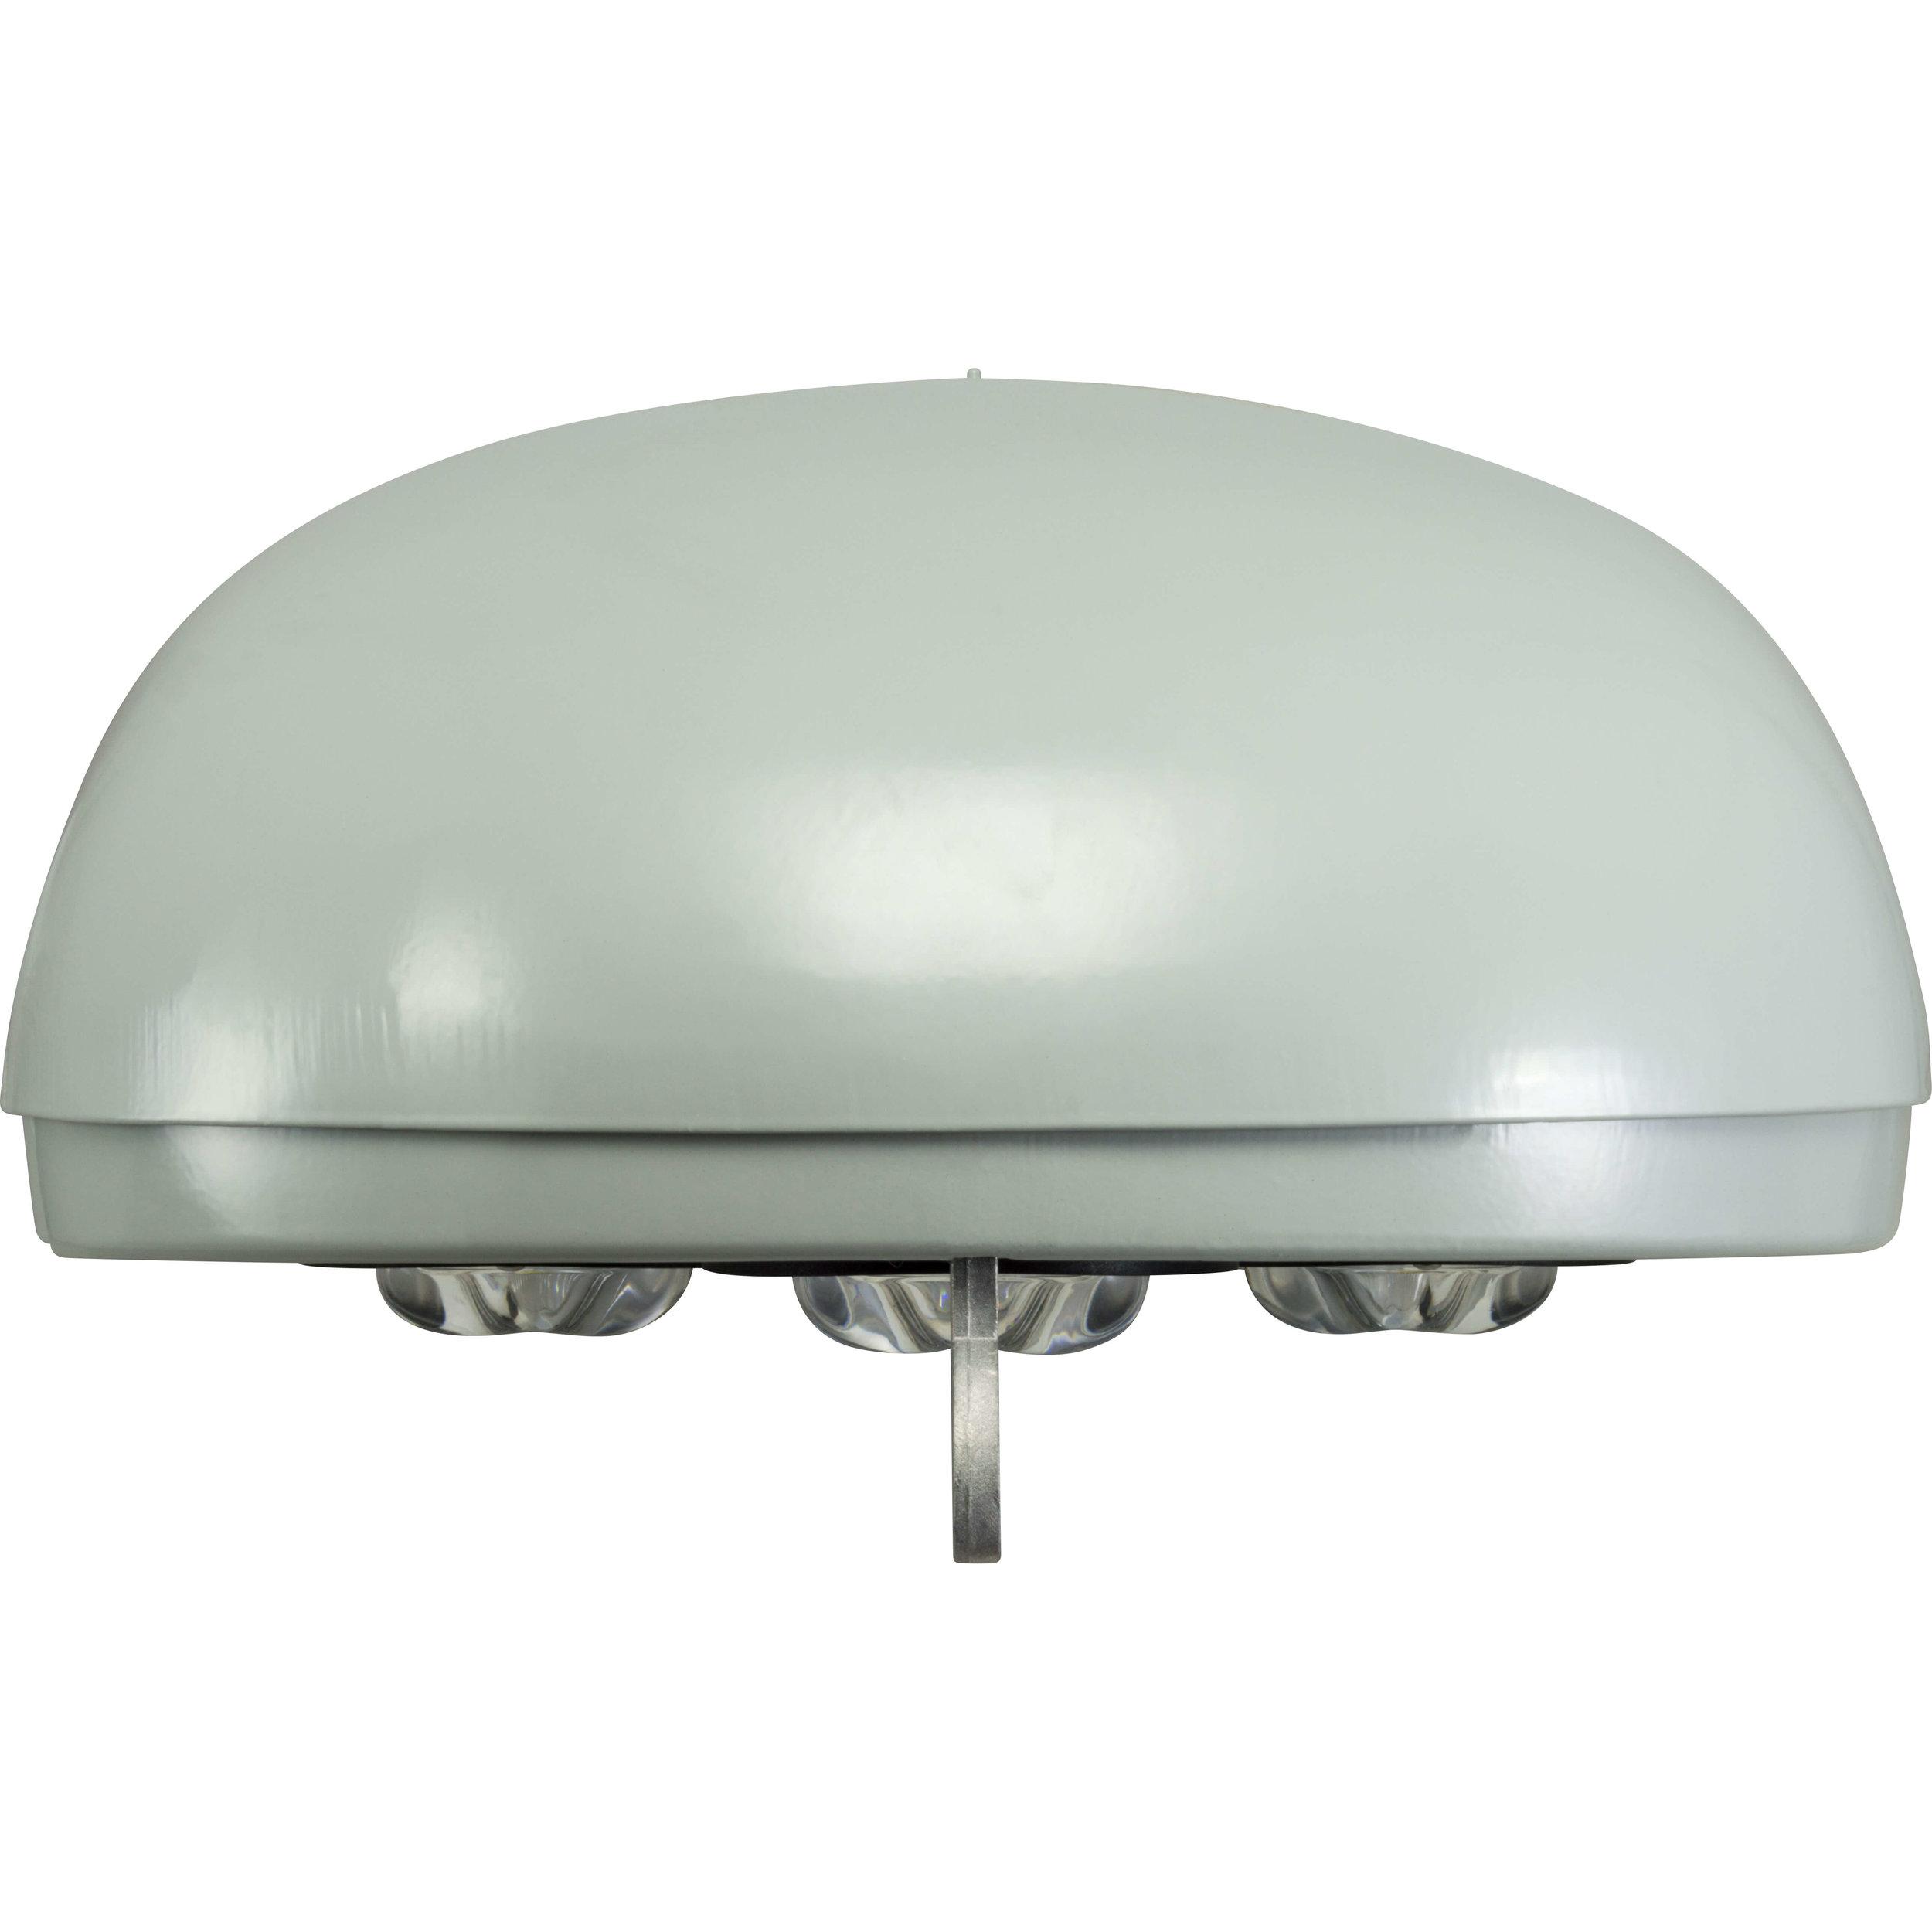 cobrahead-3-160w-web.jpg